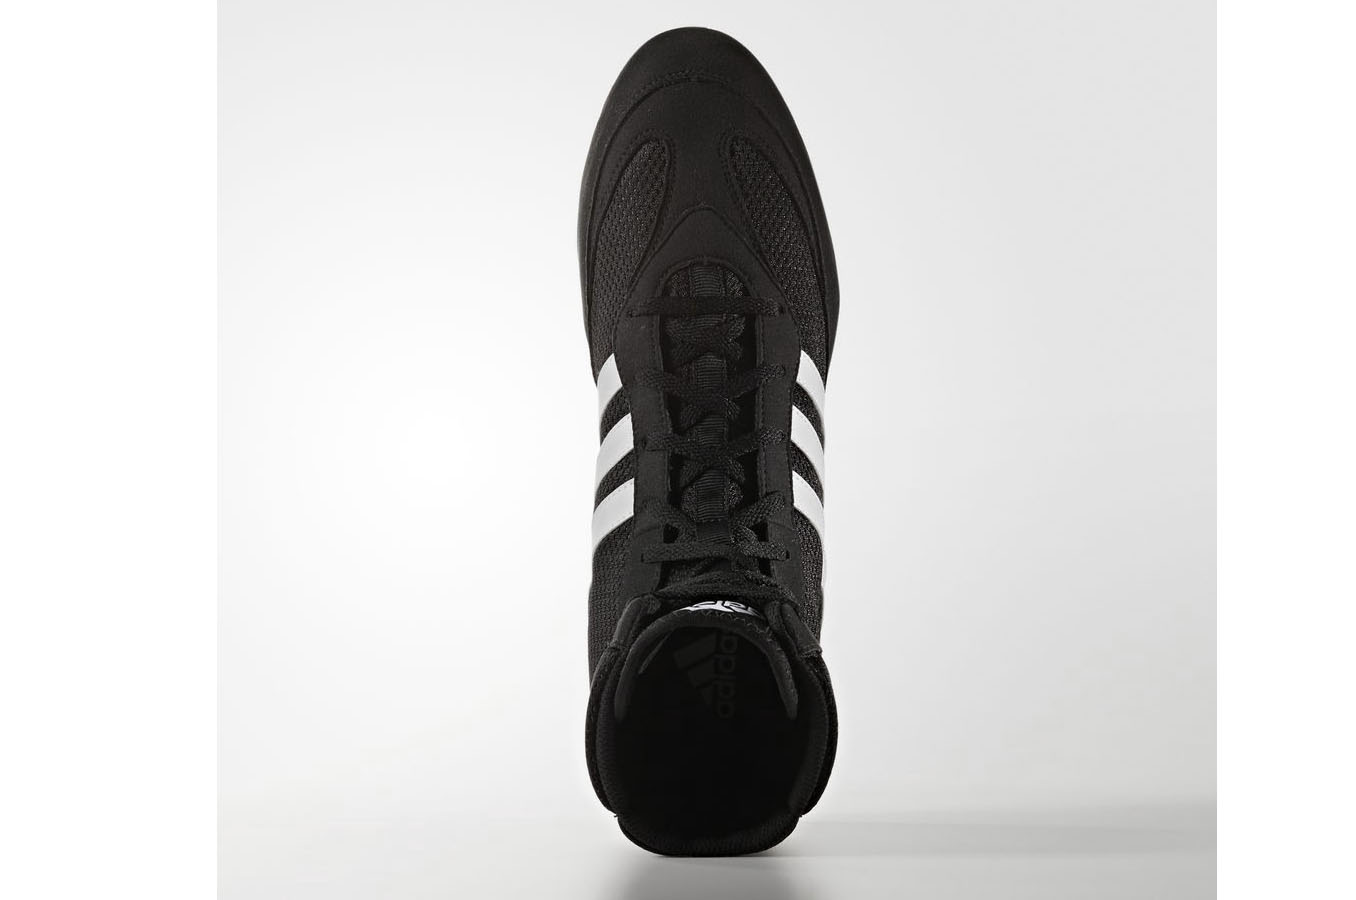 new arrival 2e53c f6aab ... English Boxing Shoes «Box Hog», Adidas BA7928 ...